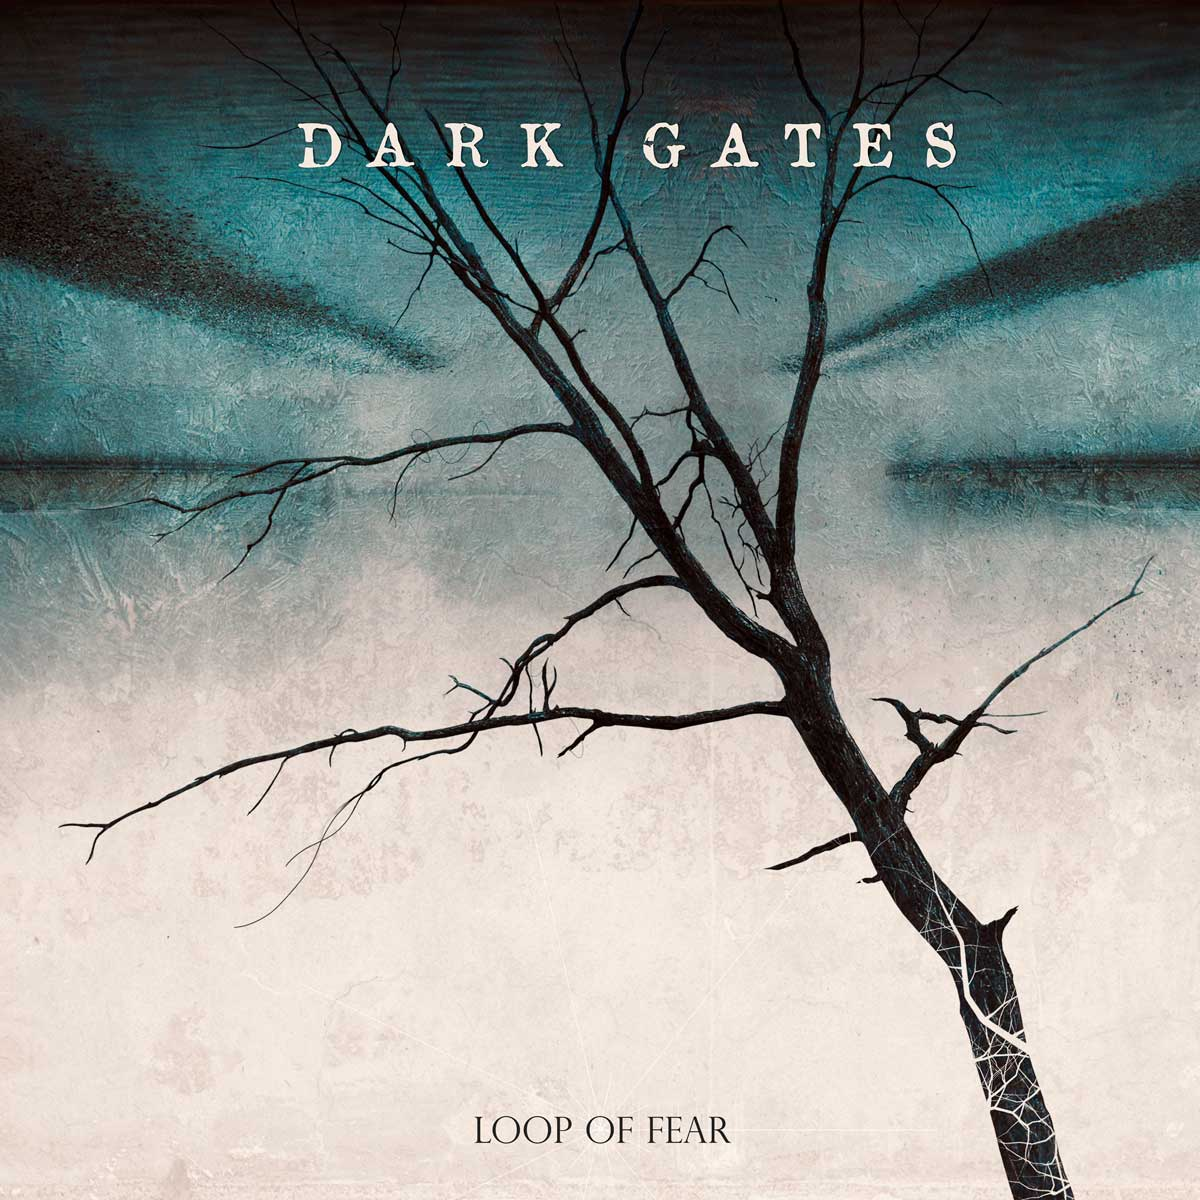 Dark Gates Loop of Fear